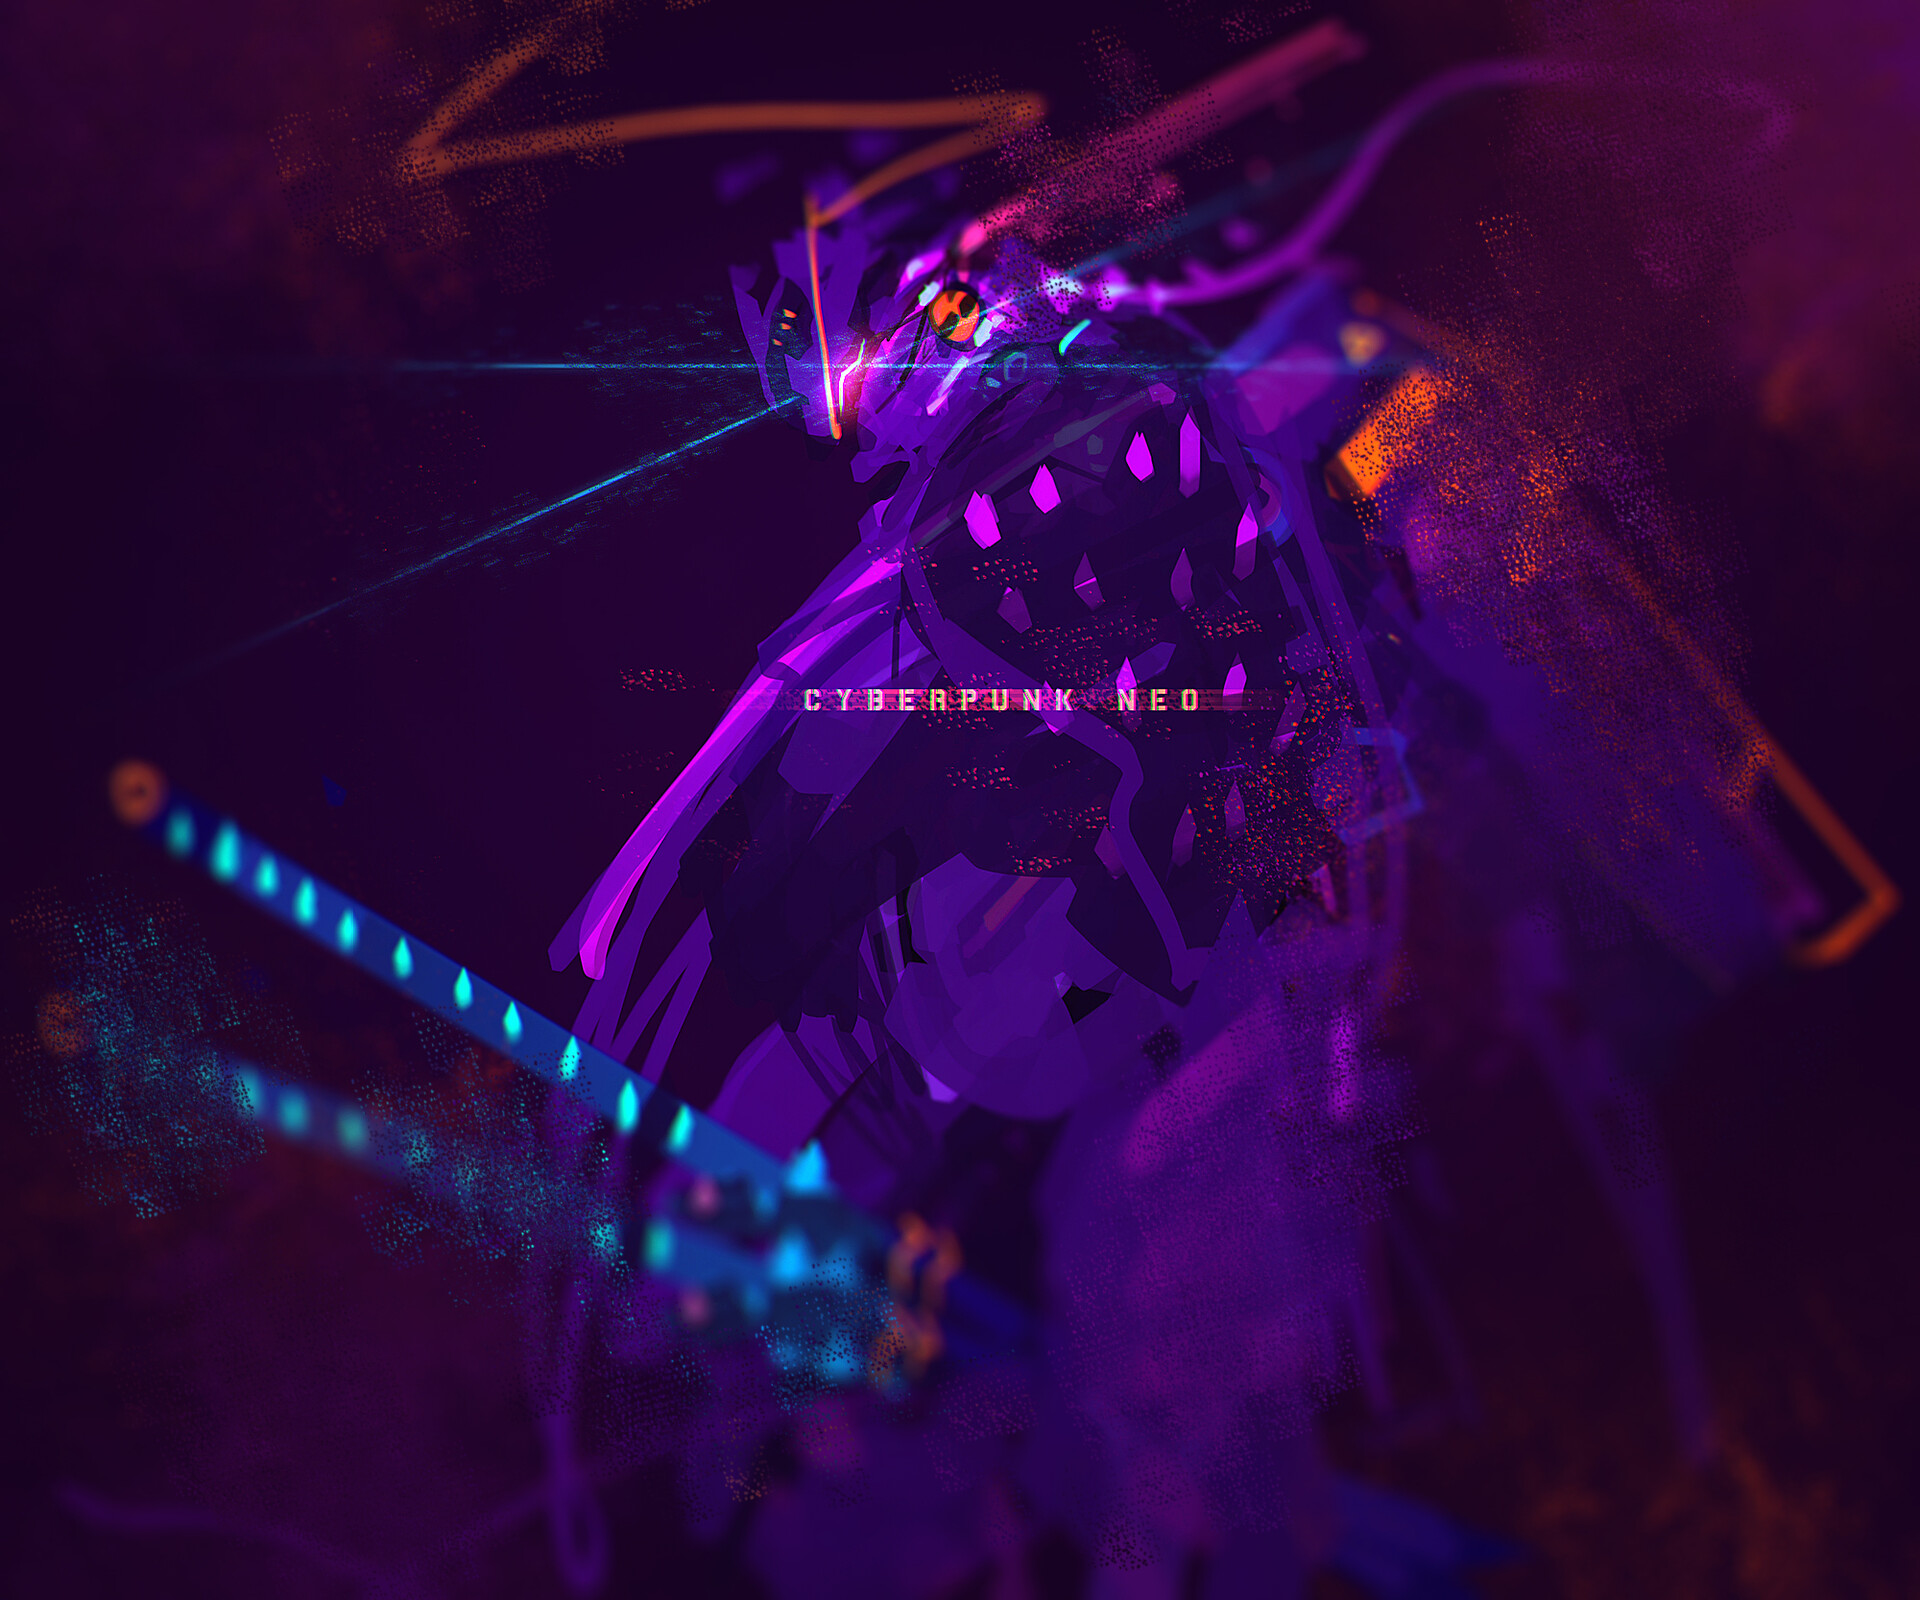 Speedpainting Cyberpunk Neo Ninja - concept art  - speedpainting style